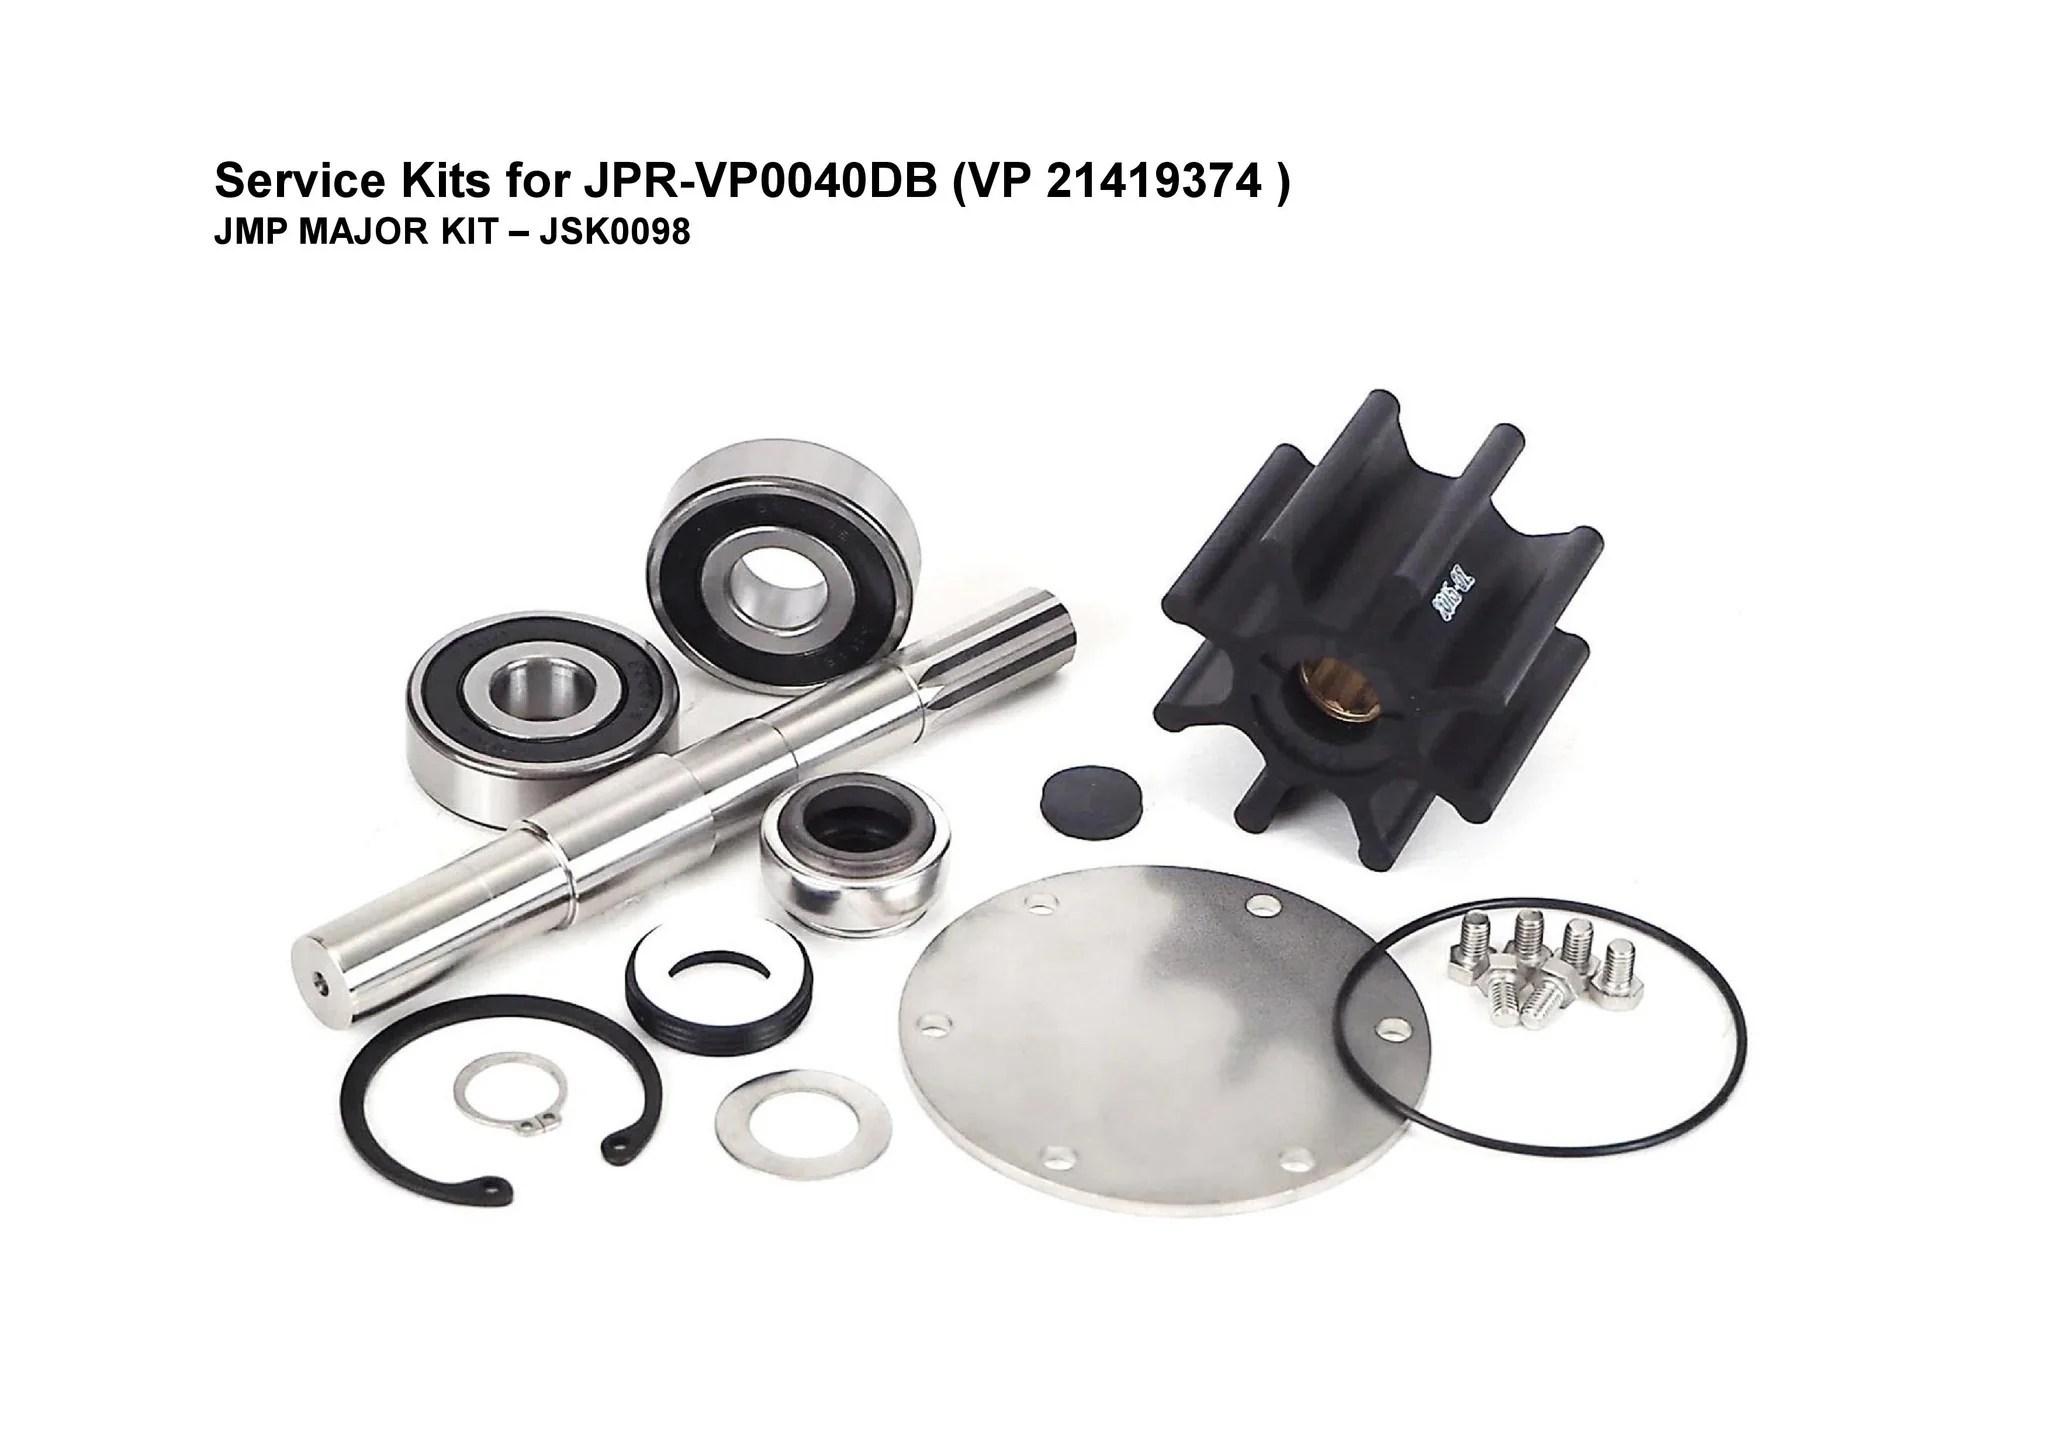 jmp jsk0098 major kit for jmp pump jpr vp0040db 21419374 fits volvo penta engines d4 225a e d4 260a e d4 260d e d4 300a e d4 300d e  [ 2048 x 1449 Pixel ]